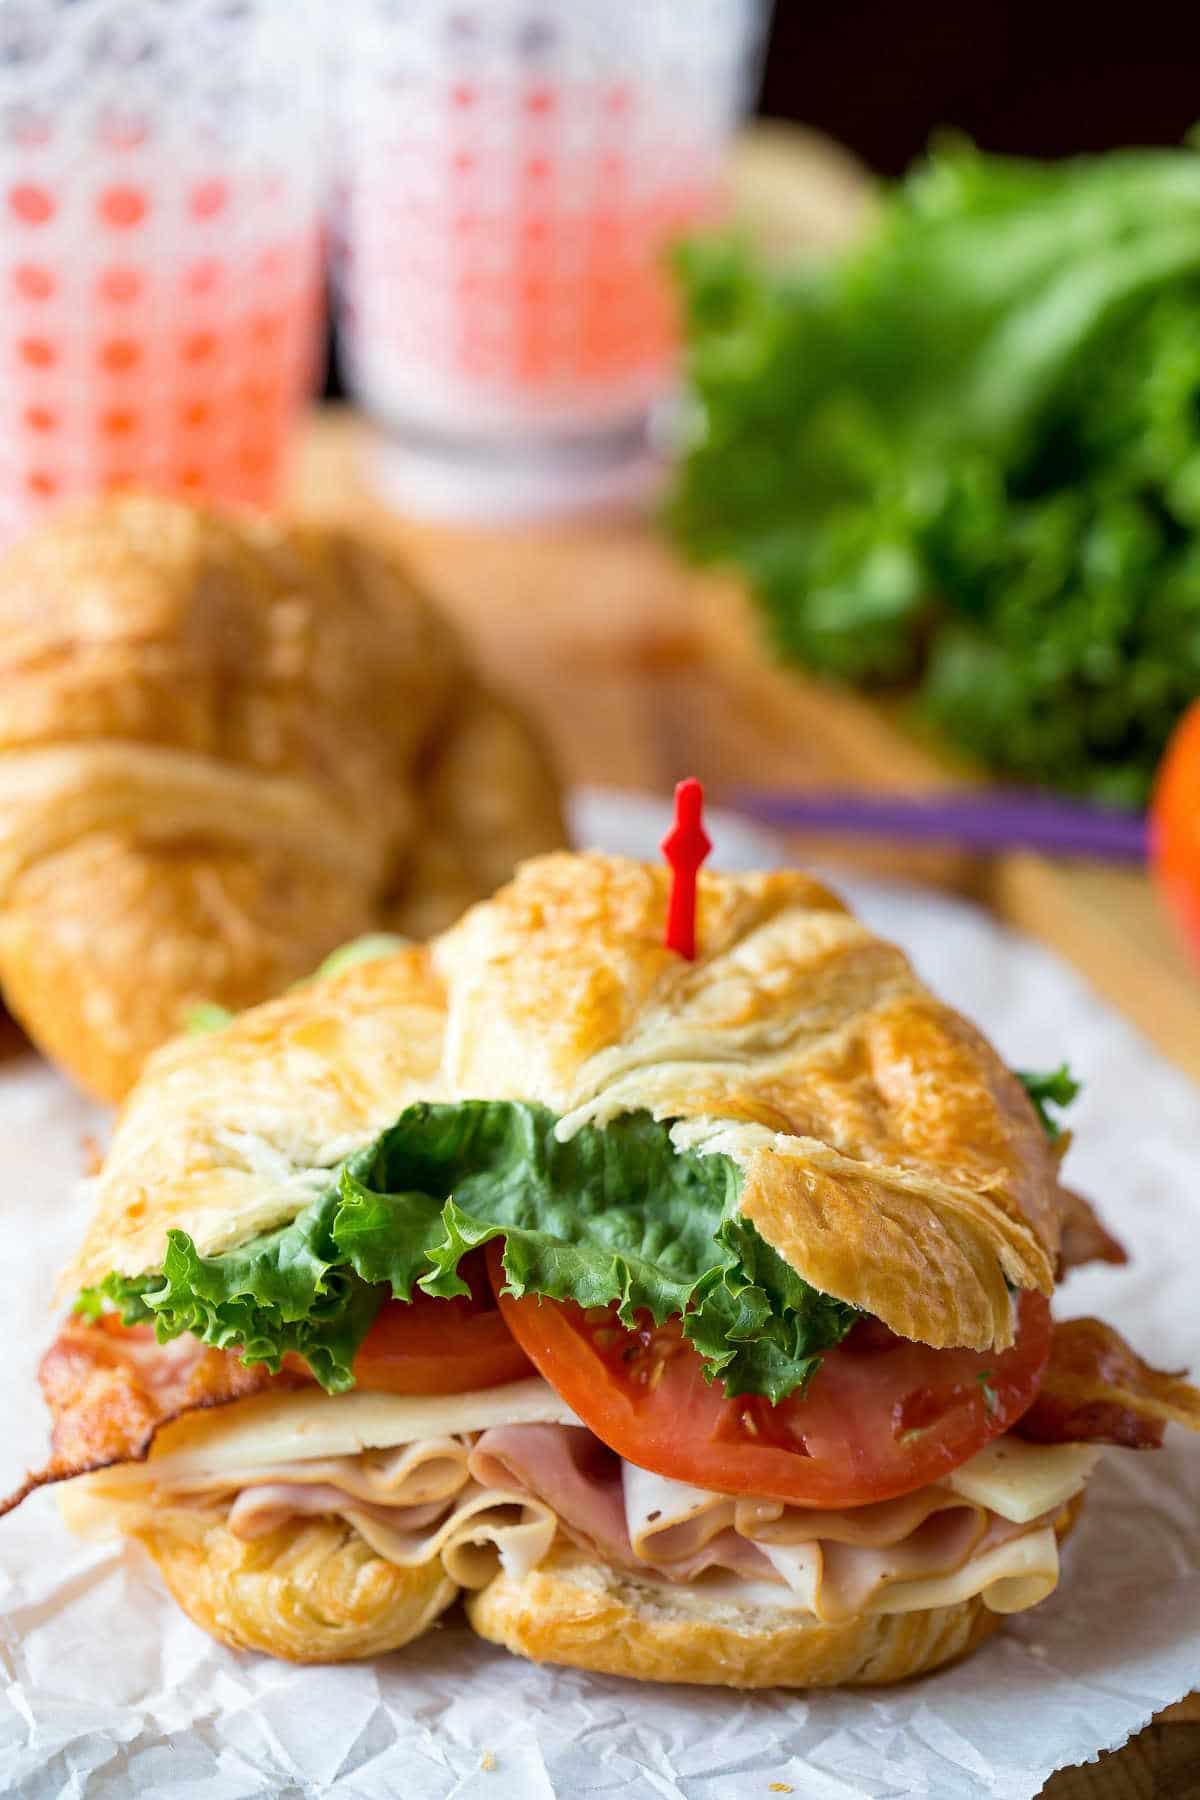 California club croissant sandwich on a piece of white parchment paper.